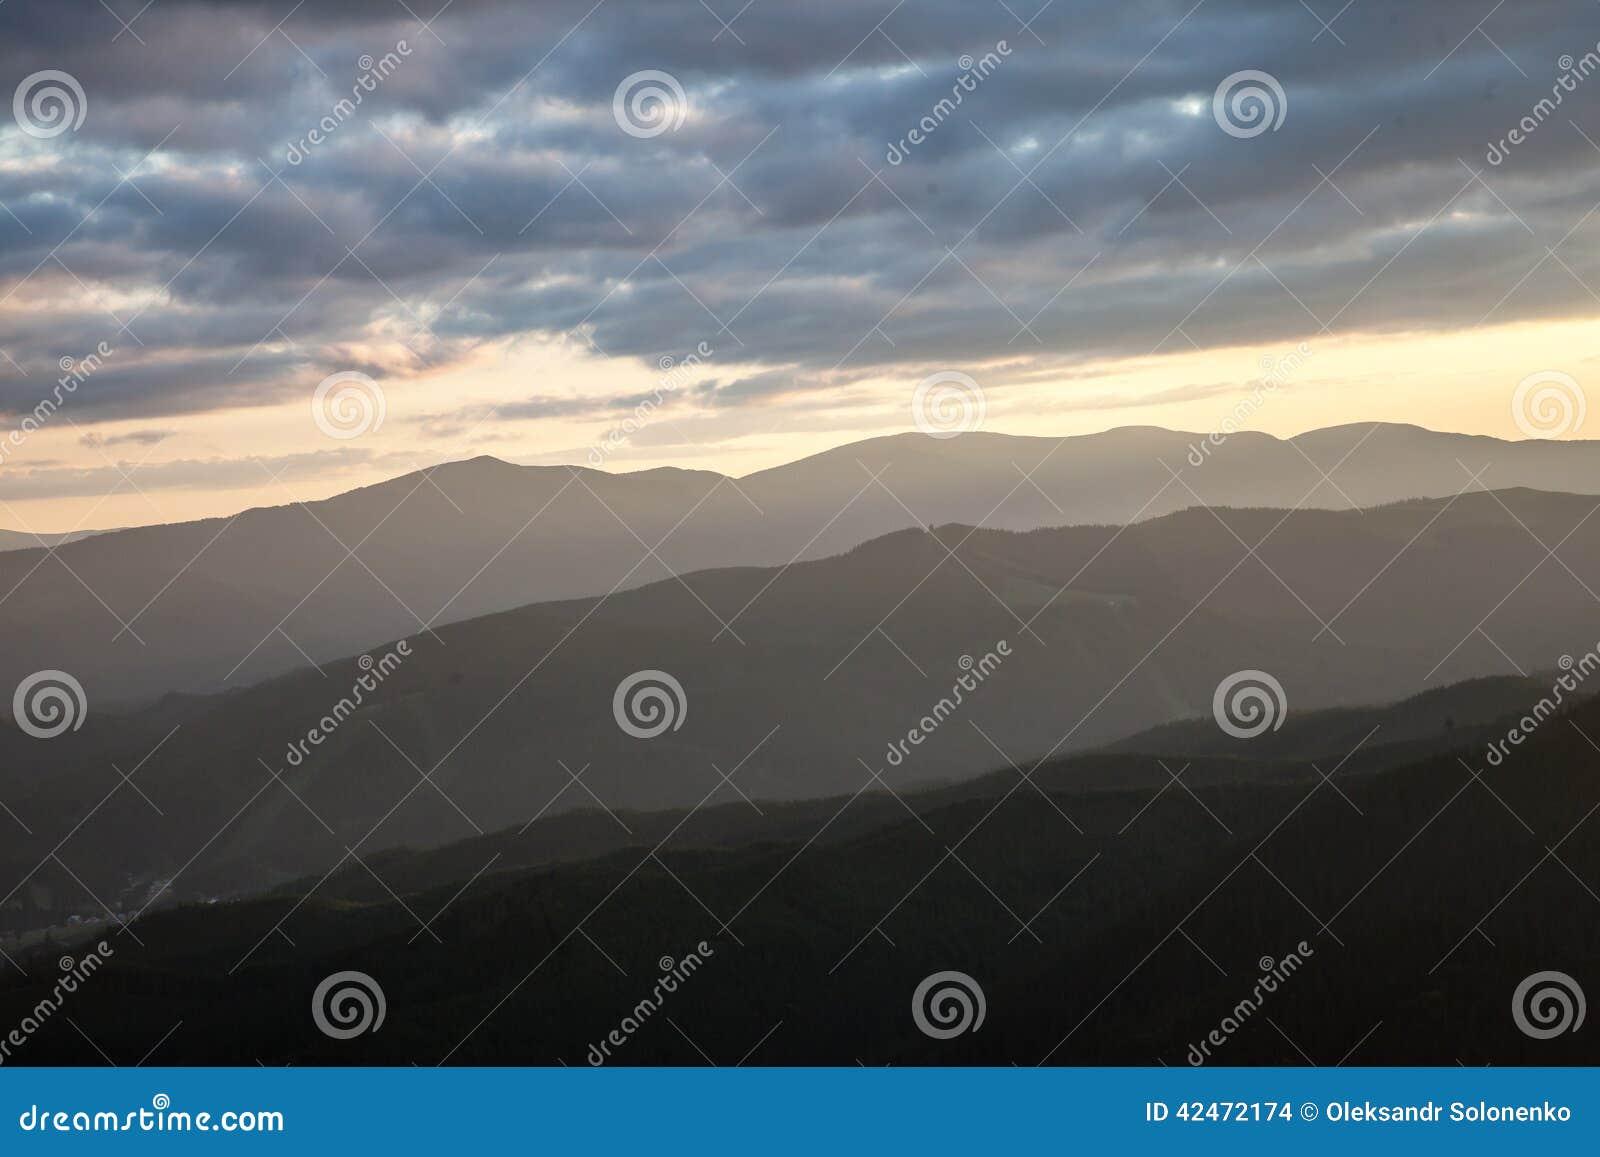 Sonnenuntergang in den Karpatenbergen